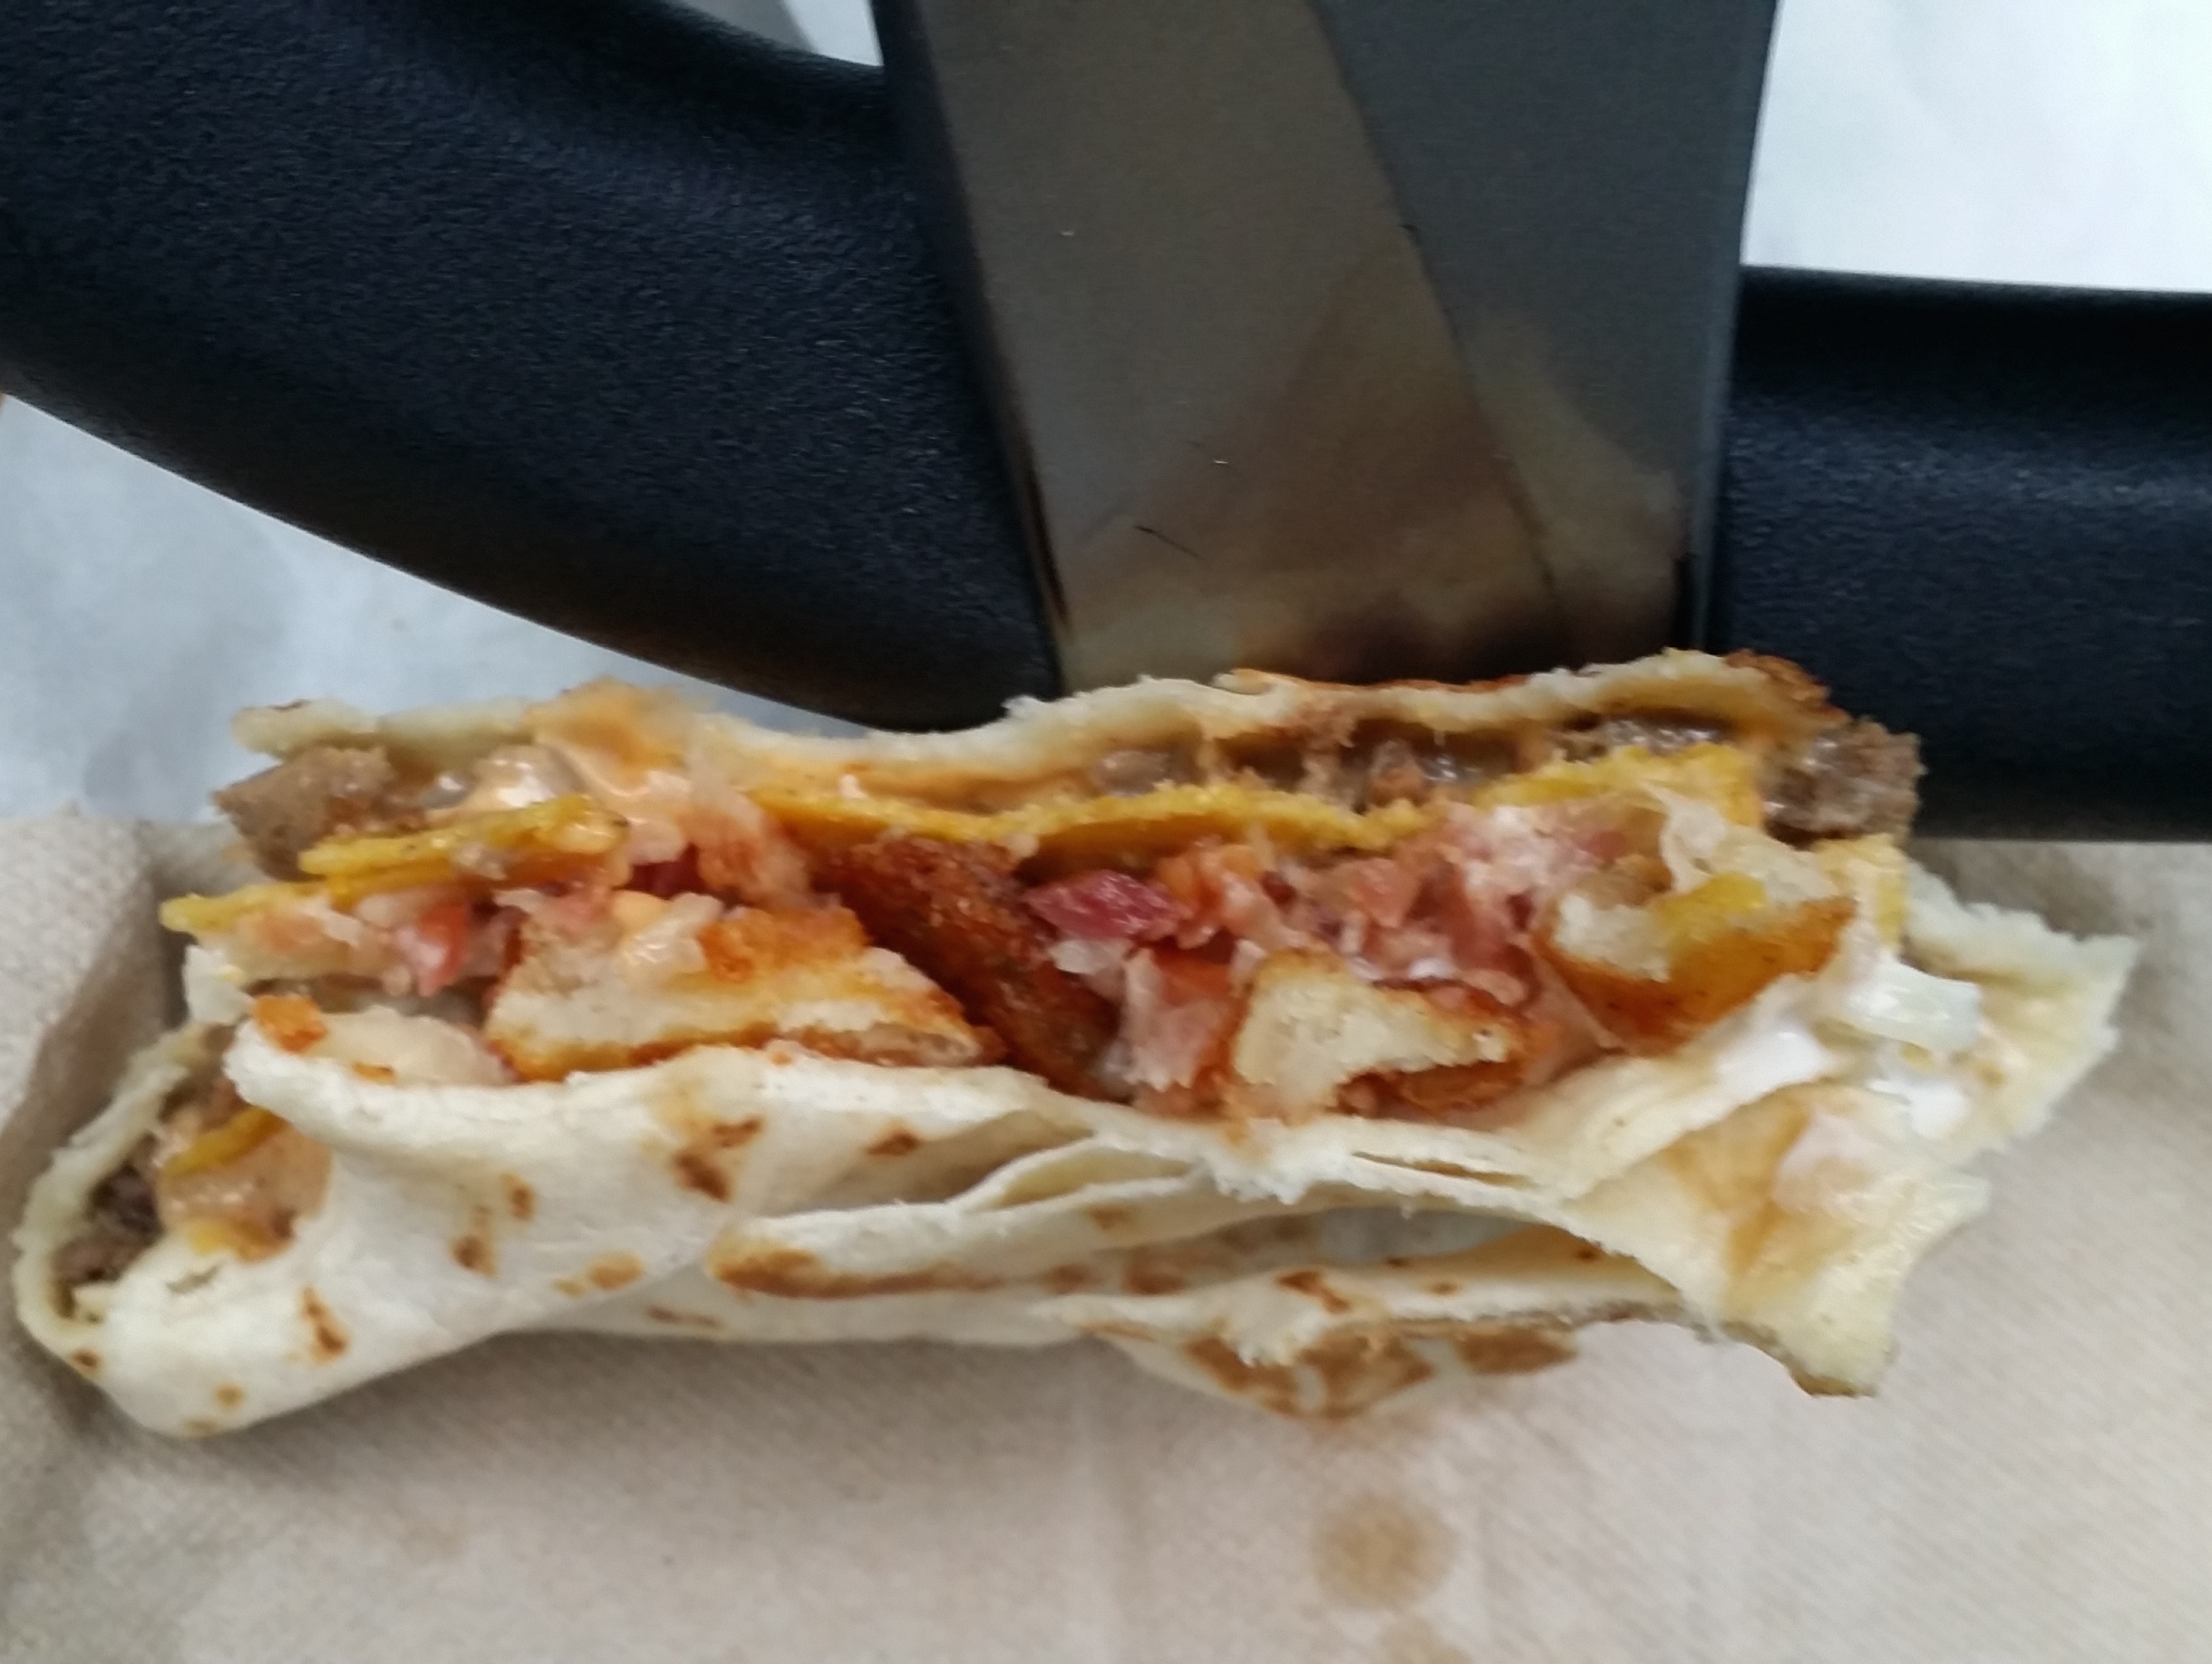 double tacos kfc